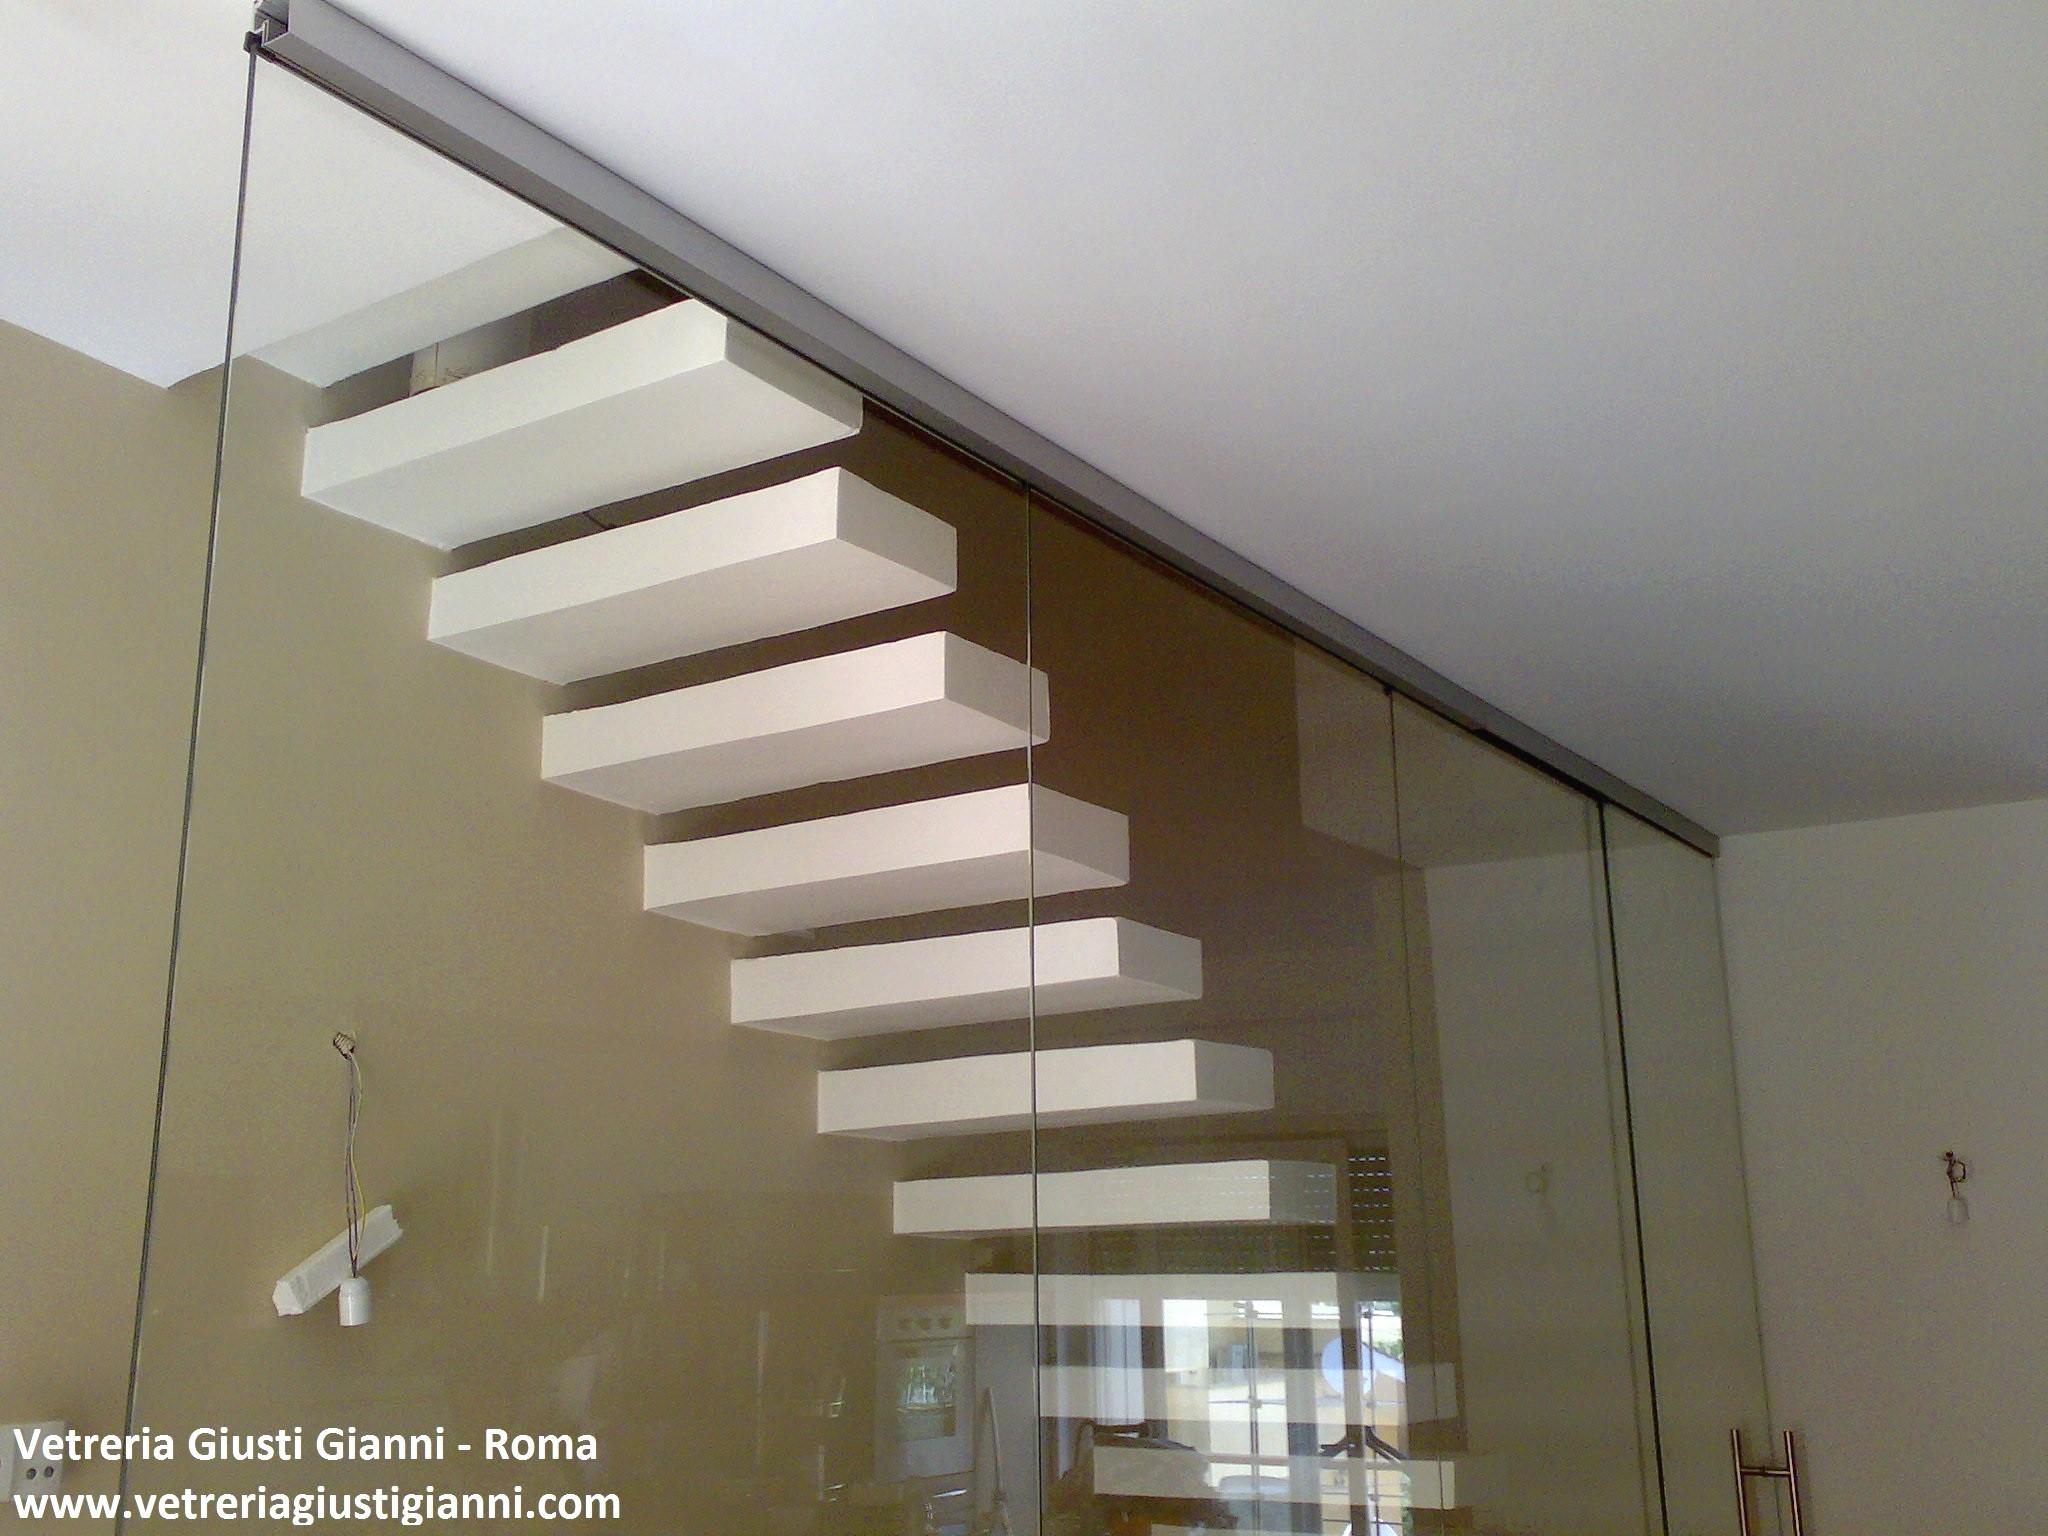 pareti in vetro roma vetreria gianni giusti avec parete per scale dettaglio et interni 25 px all 21 charmant b ton cir ext rieur leroy merlin beericious luxe beton